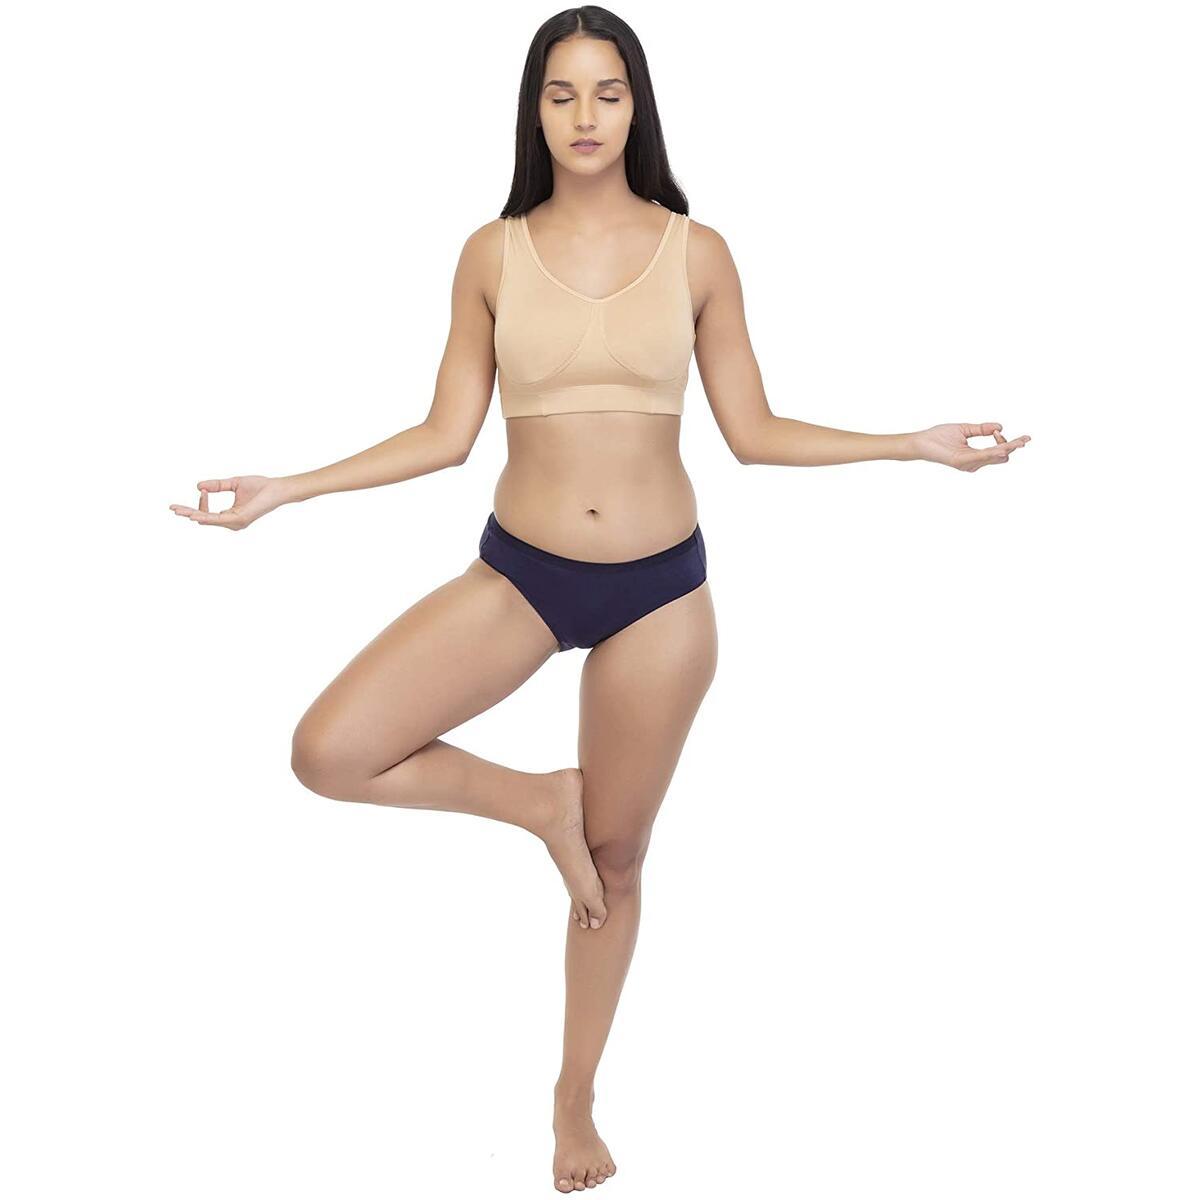 Irotica Sleep Bra for Women, Seamless Stretchy Sports Bra, Yoga Bra, Post Surgery Bra, White, Skin, Pink (Small, Medium, Large, X-Large, XX-Large)